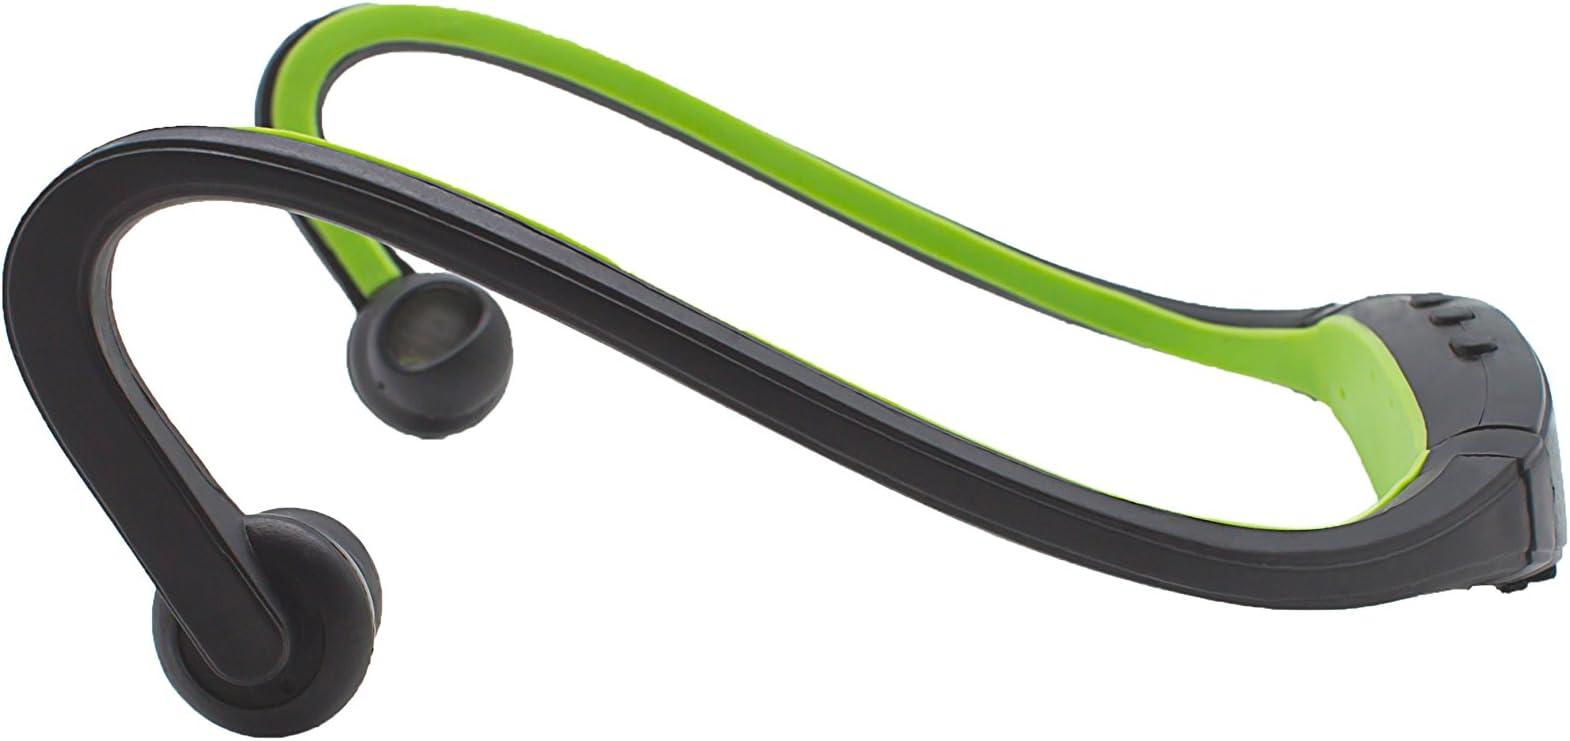 Imperii Electronics TE.08.0041.05 0041.05-Pack Brazalete y Auriculares Deportivos Bluetooth, Color Verde, Unisex, M: Amazon.es: Electrónica